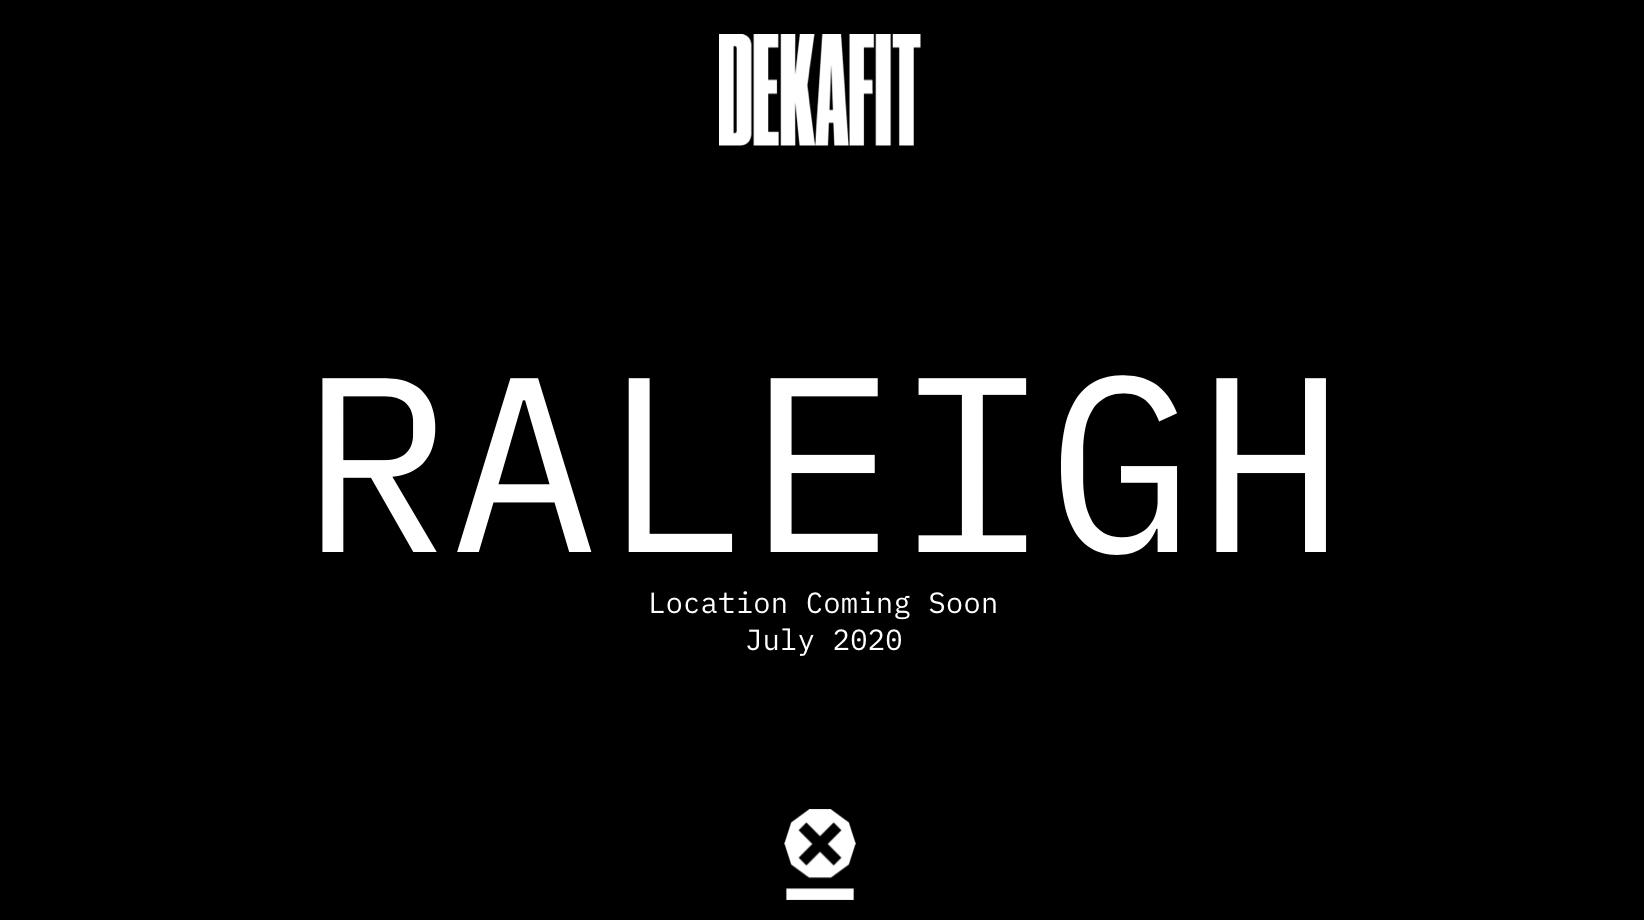 DEKAFIT North Carolina - PRE REGISTRATION